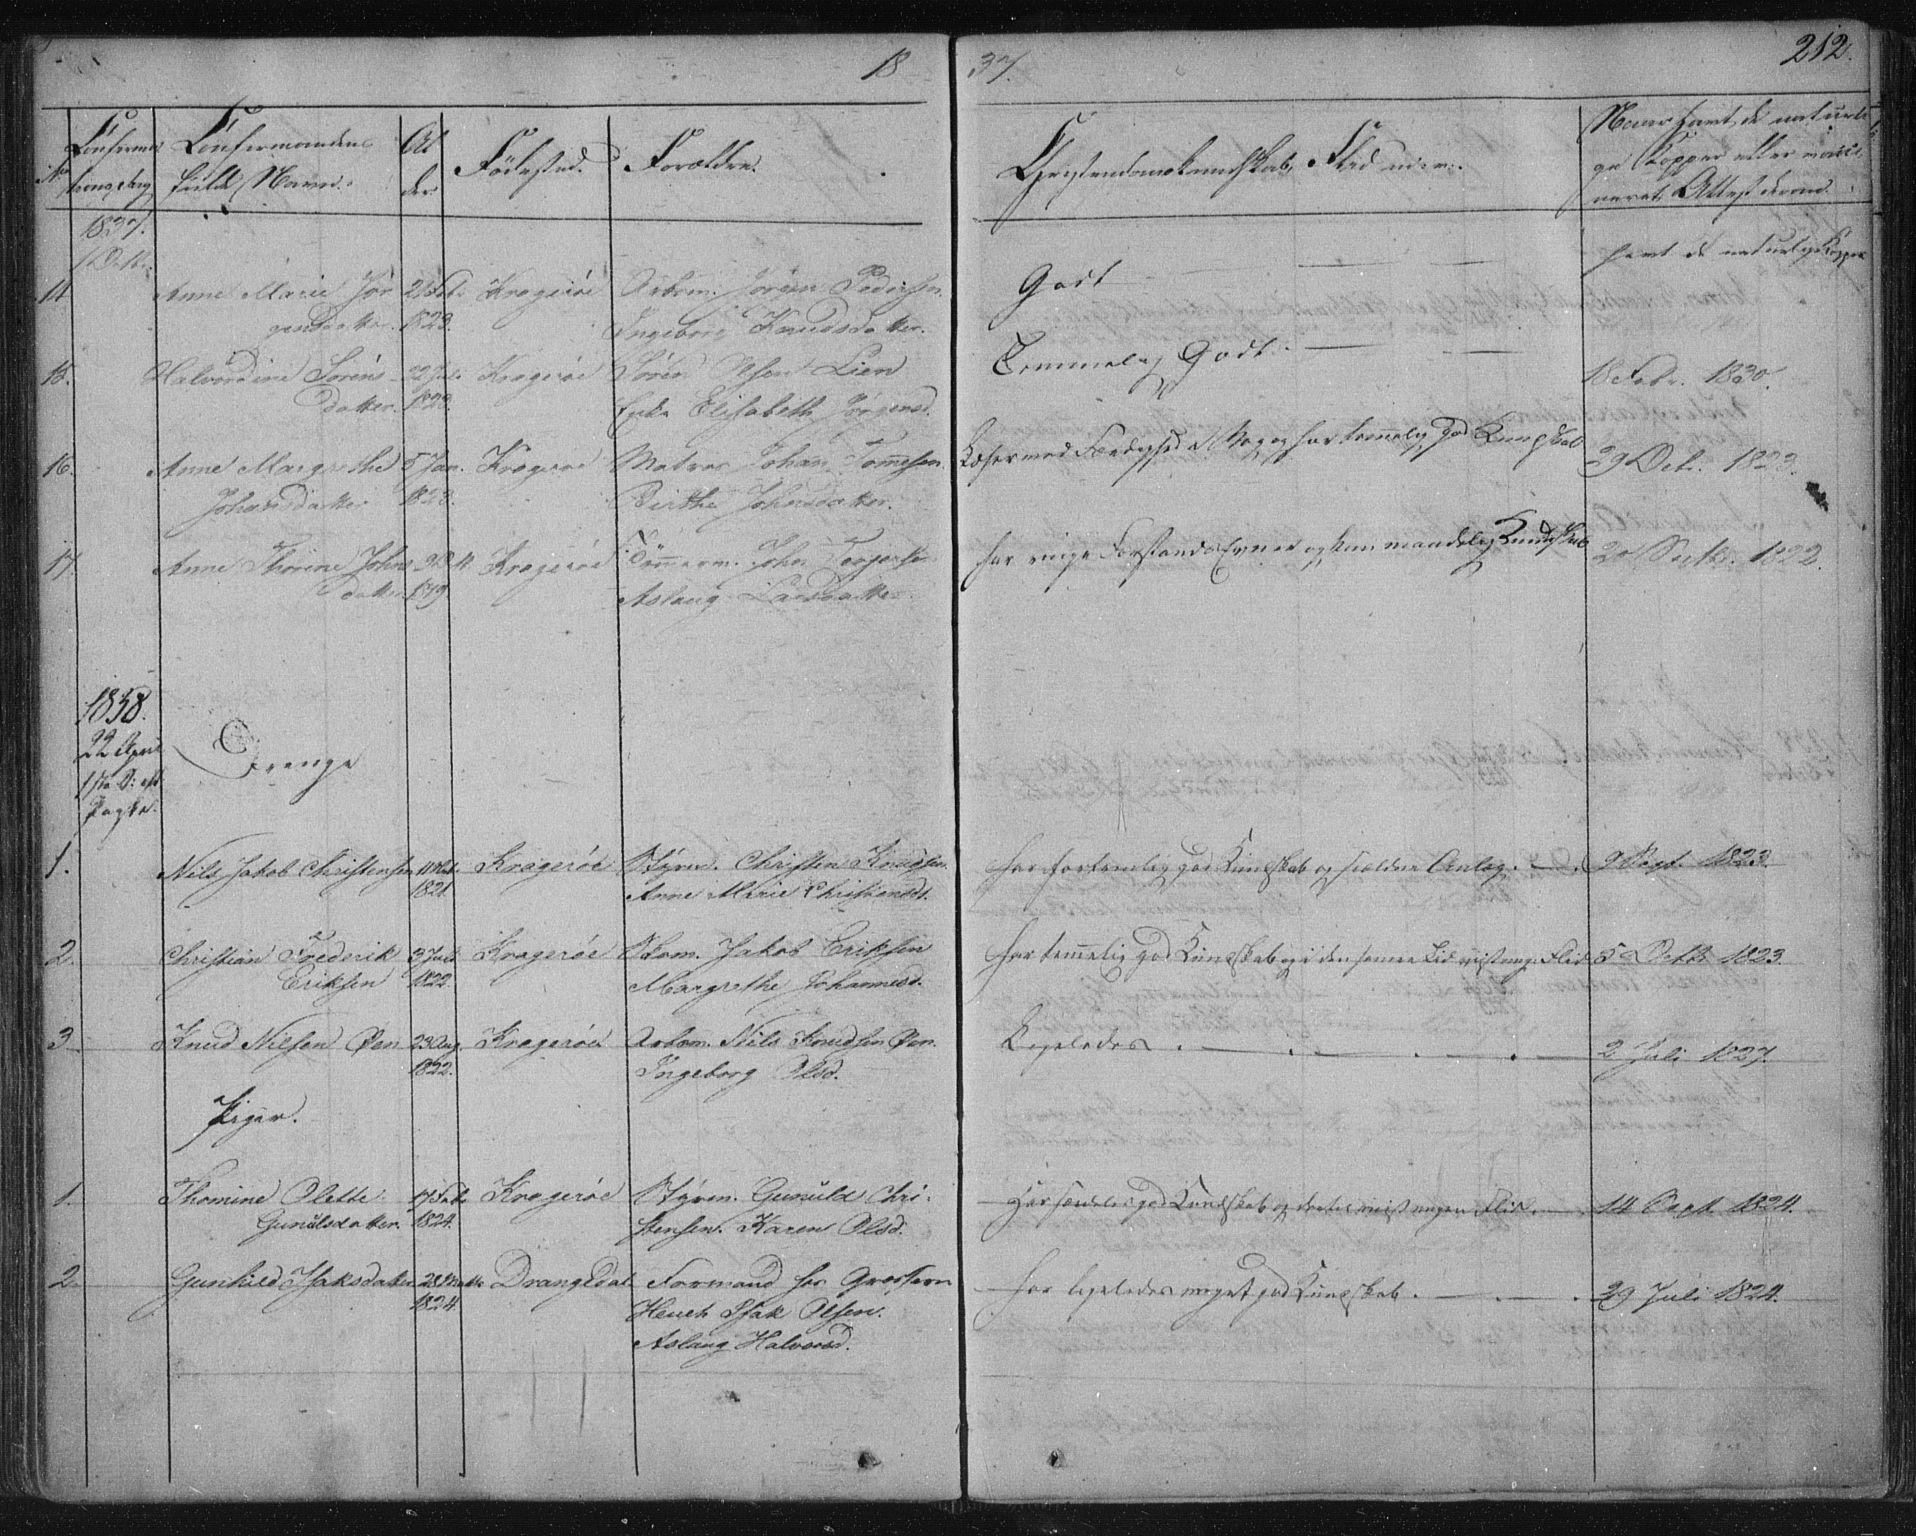 SAKO, Kragerø kirkebøker, F/Fa/L0005: Ministerialbok nr. 5, 1832-1847, s. 212